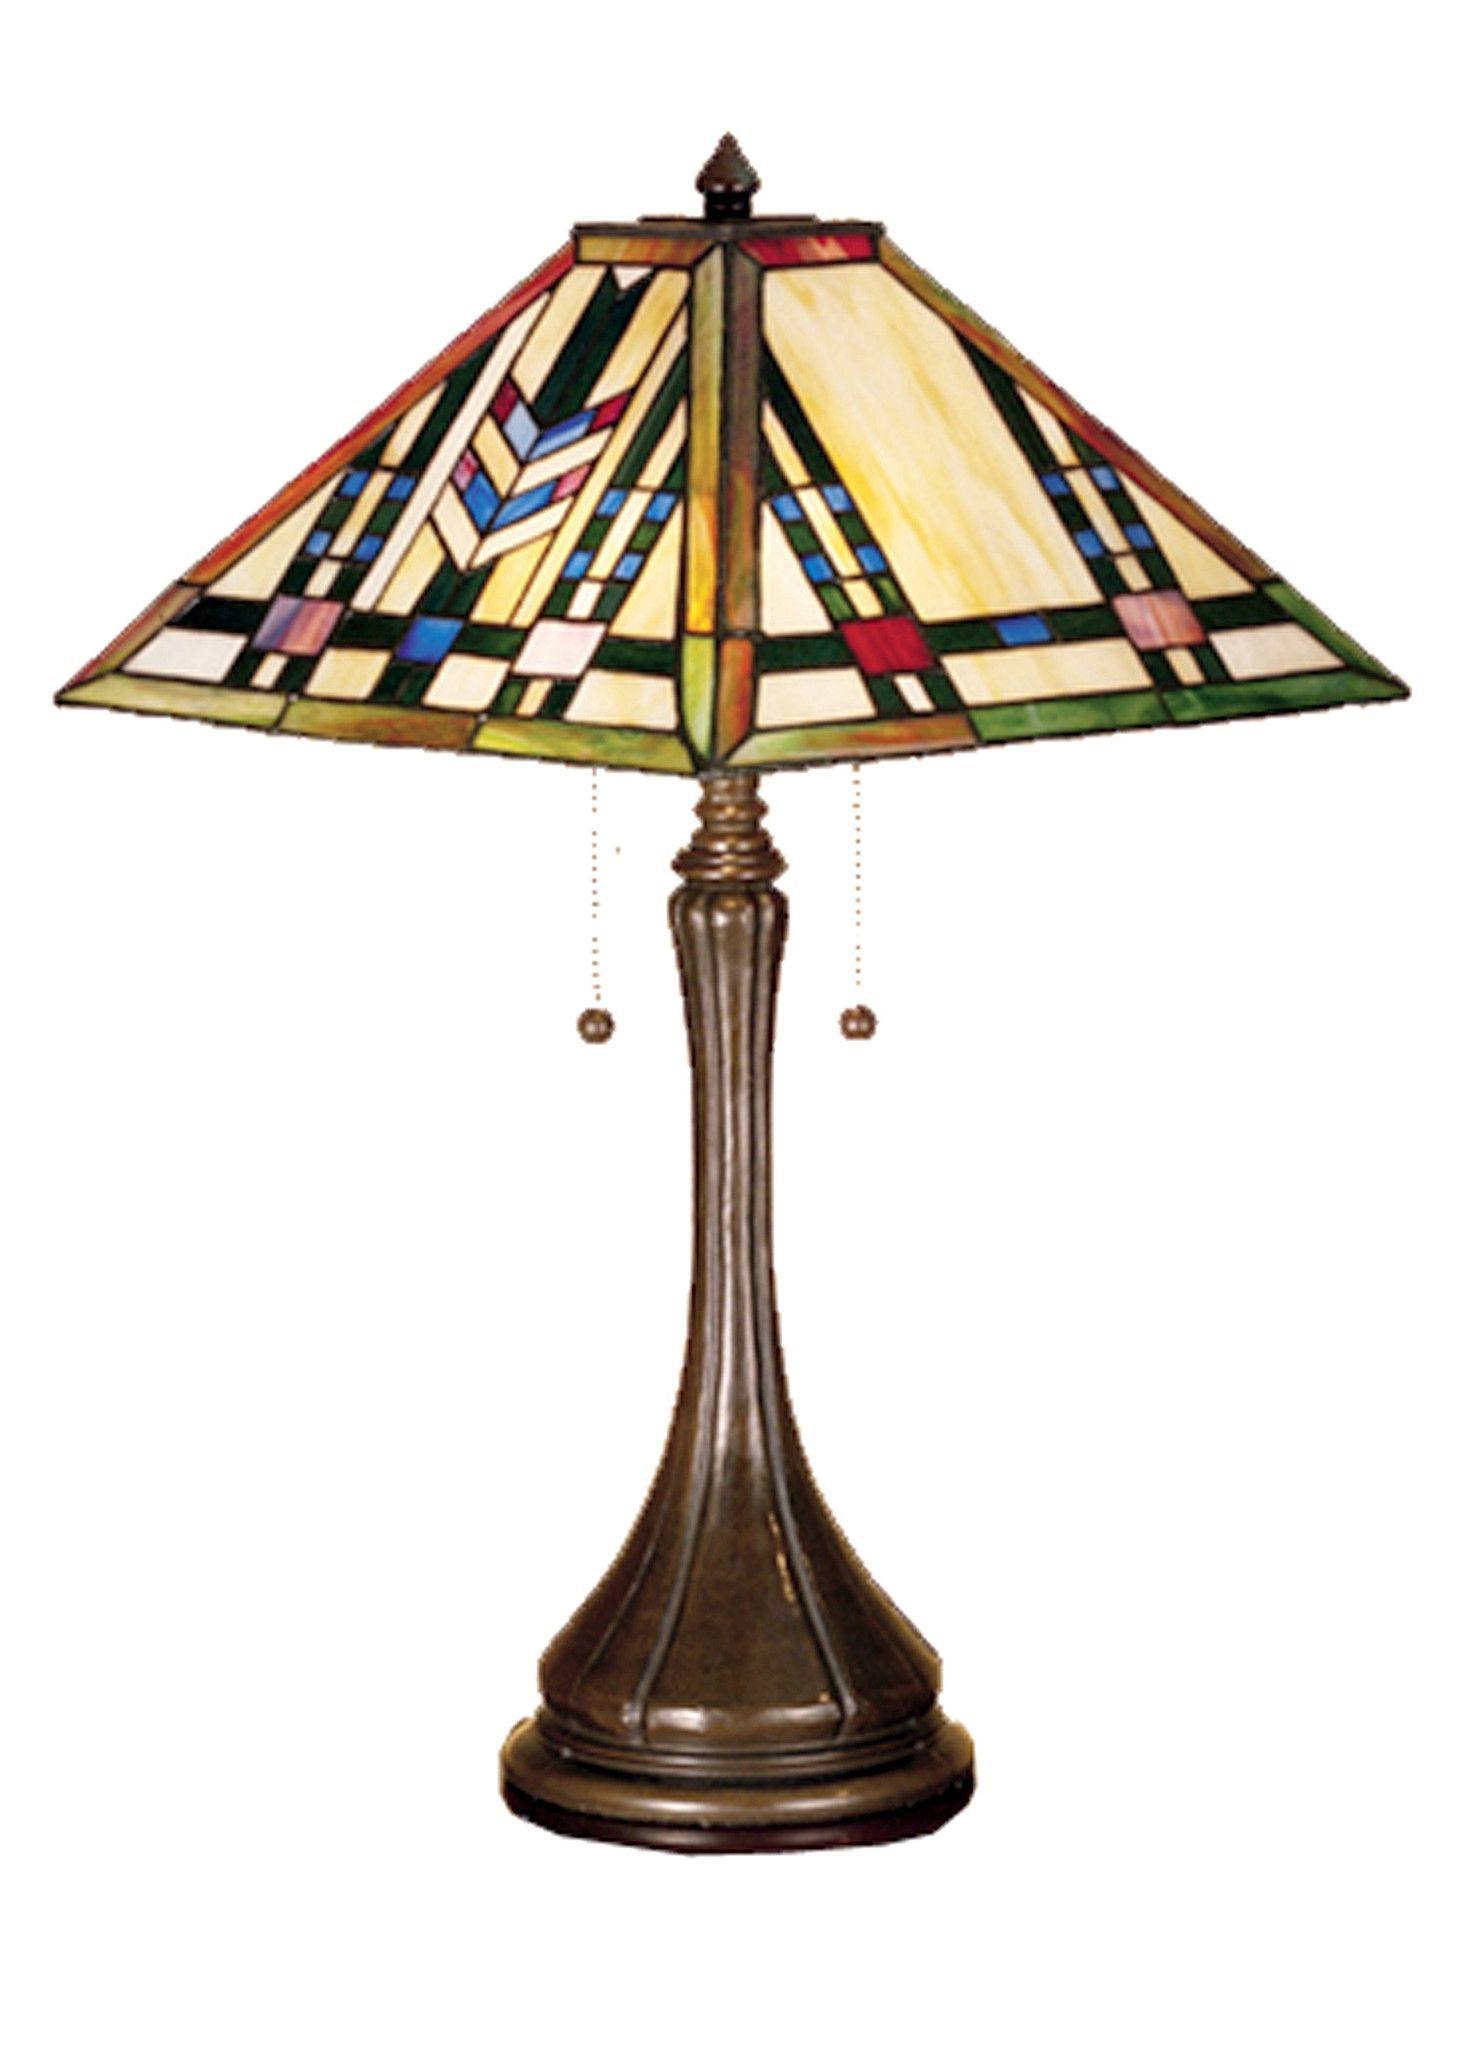 23 H Prairie Wheat Tiffany Southwest Table Lamp Tiffany Table Lamps Lamp Table Lamp